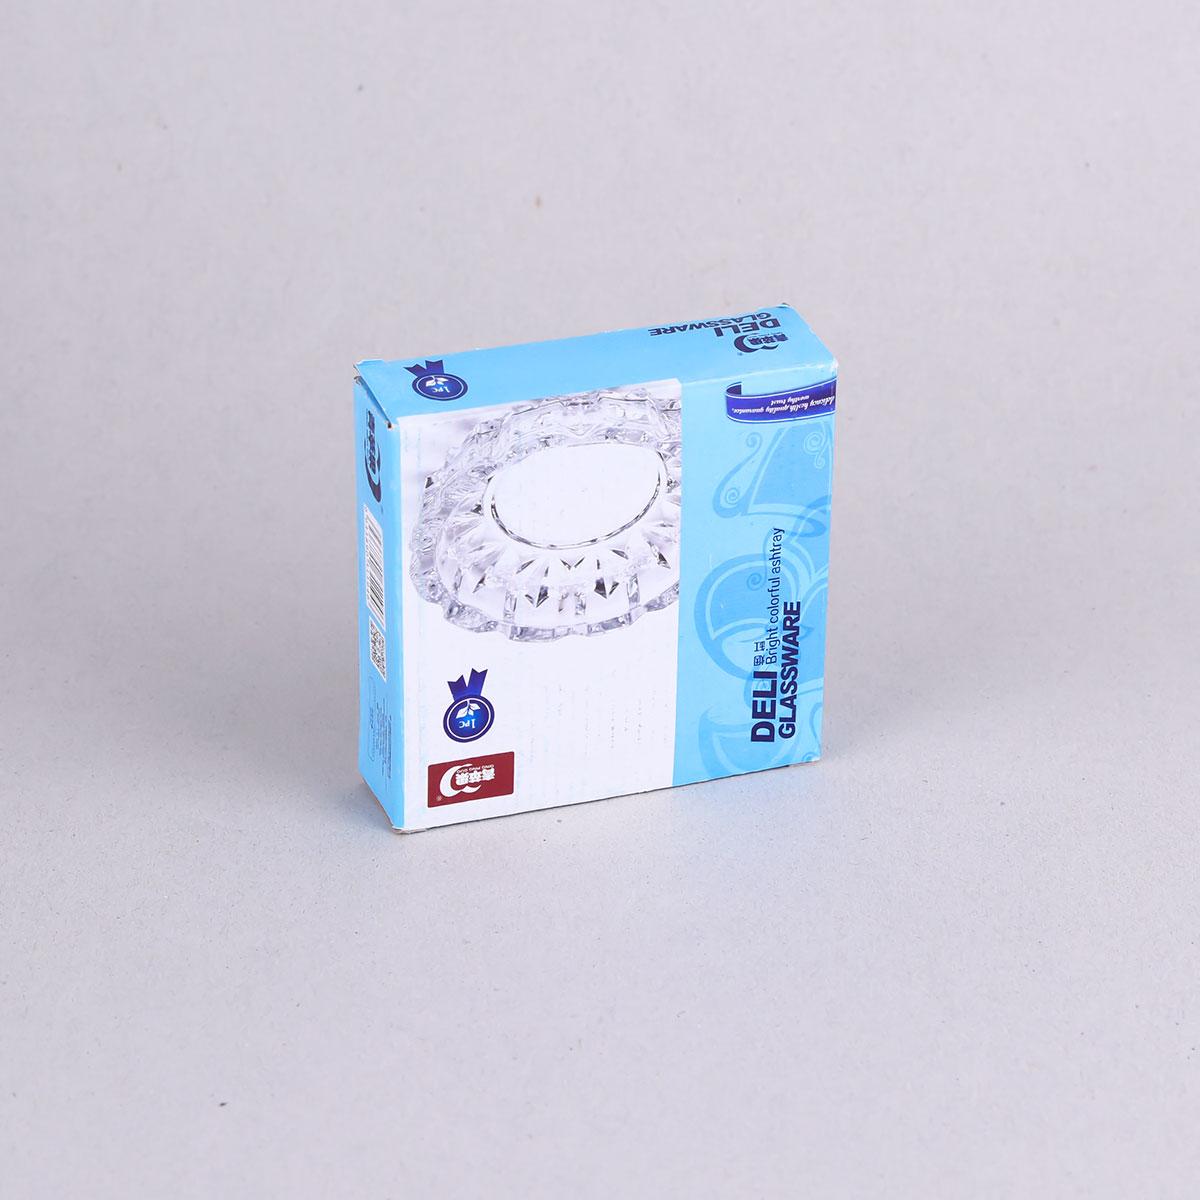 طفاية سجائر زجاج شفاف , مدور برقم YG1006